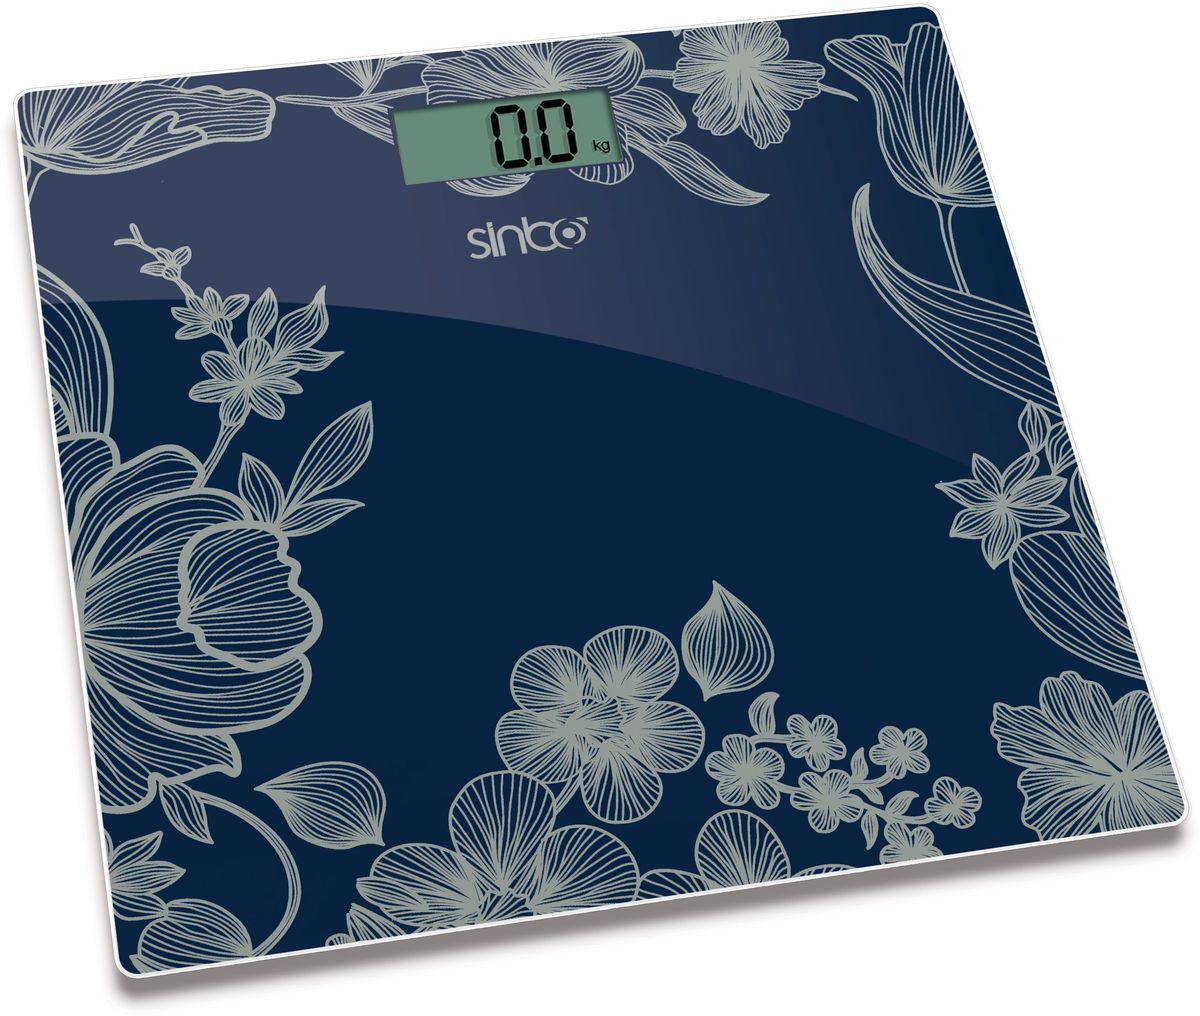 Sinbo SBS 4429, Blue весы напольные кухонные весы sinbo весы кухонные sinbo sks 4514 серебристый